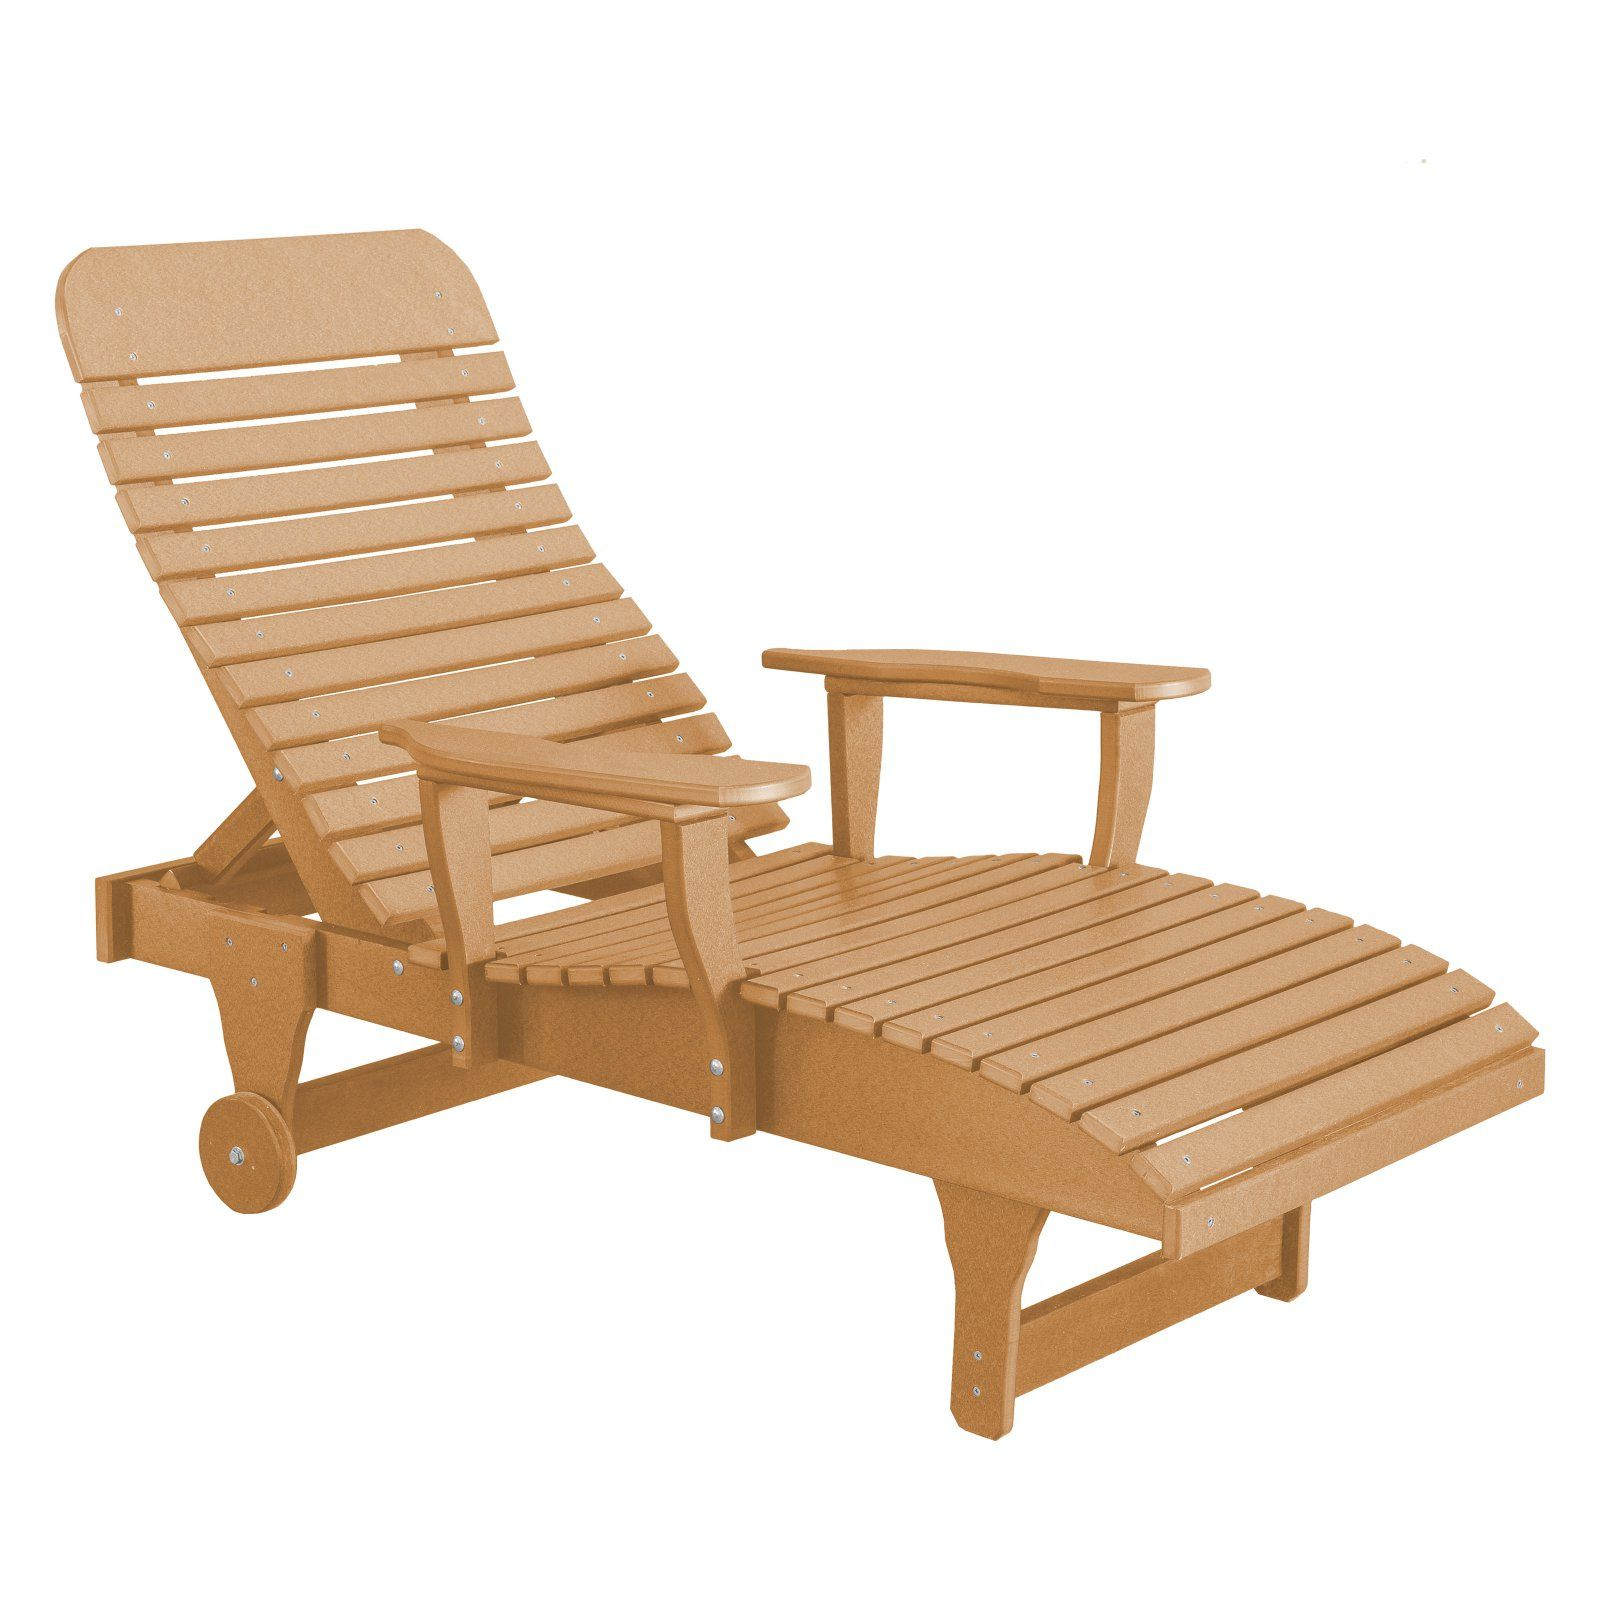 Outdoor Wildridge Heritage Patio Chaise Lounge Lounge Chair